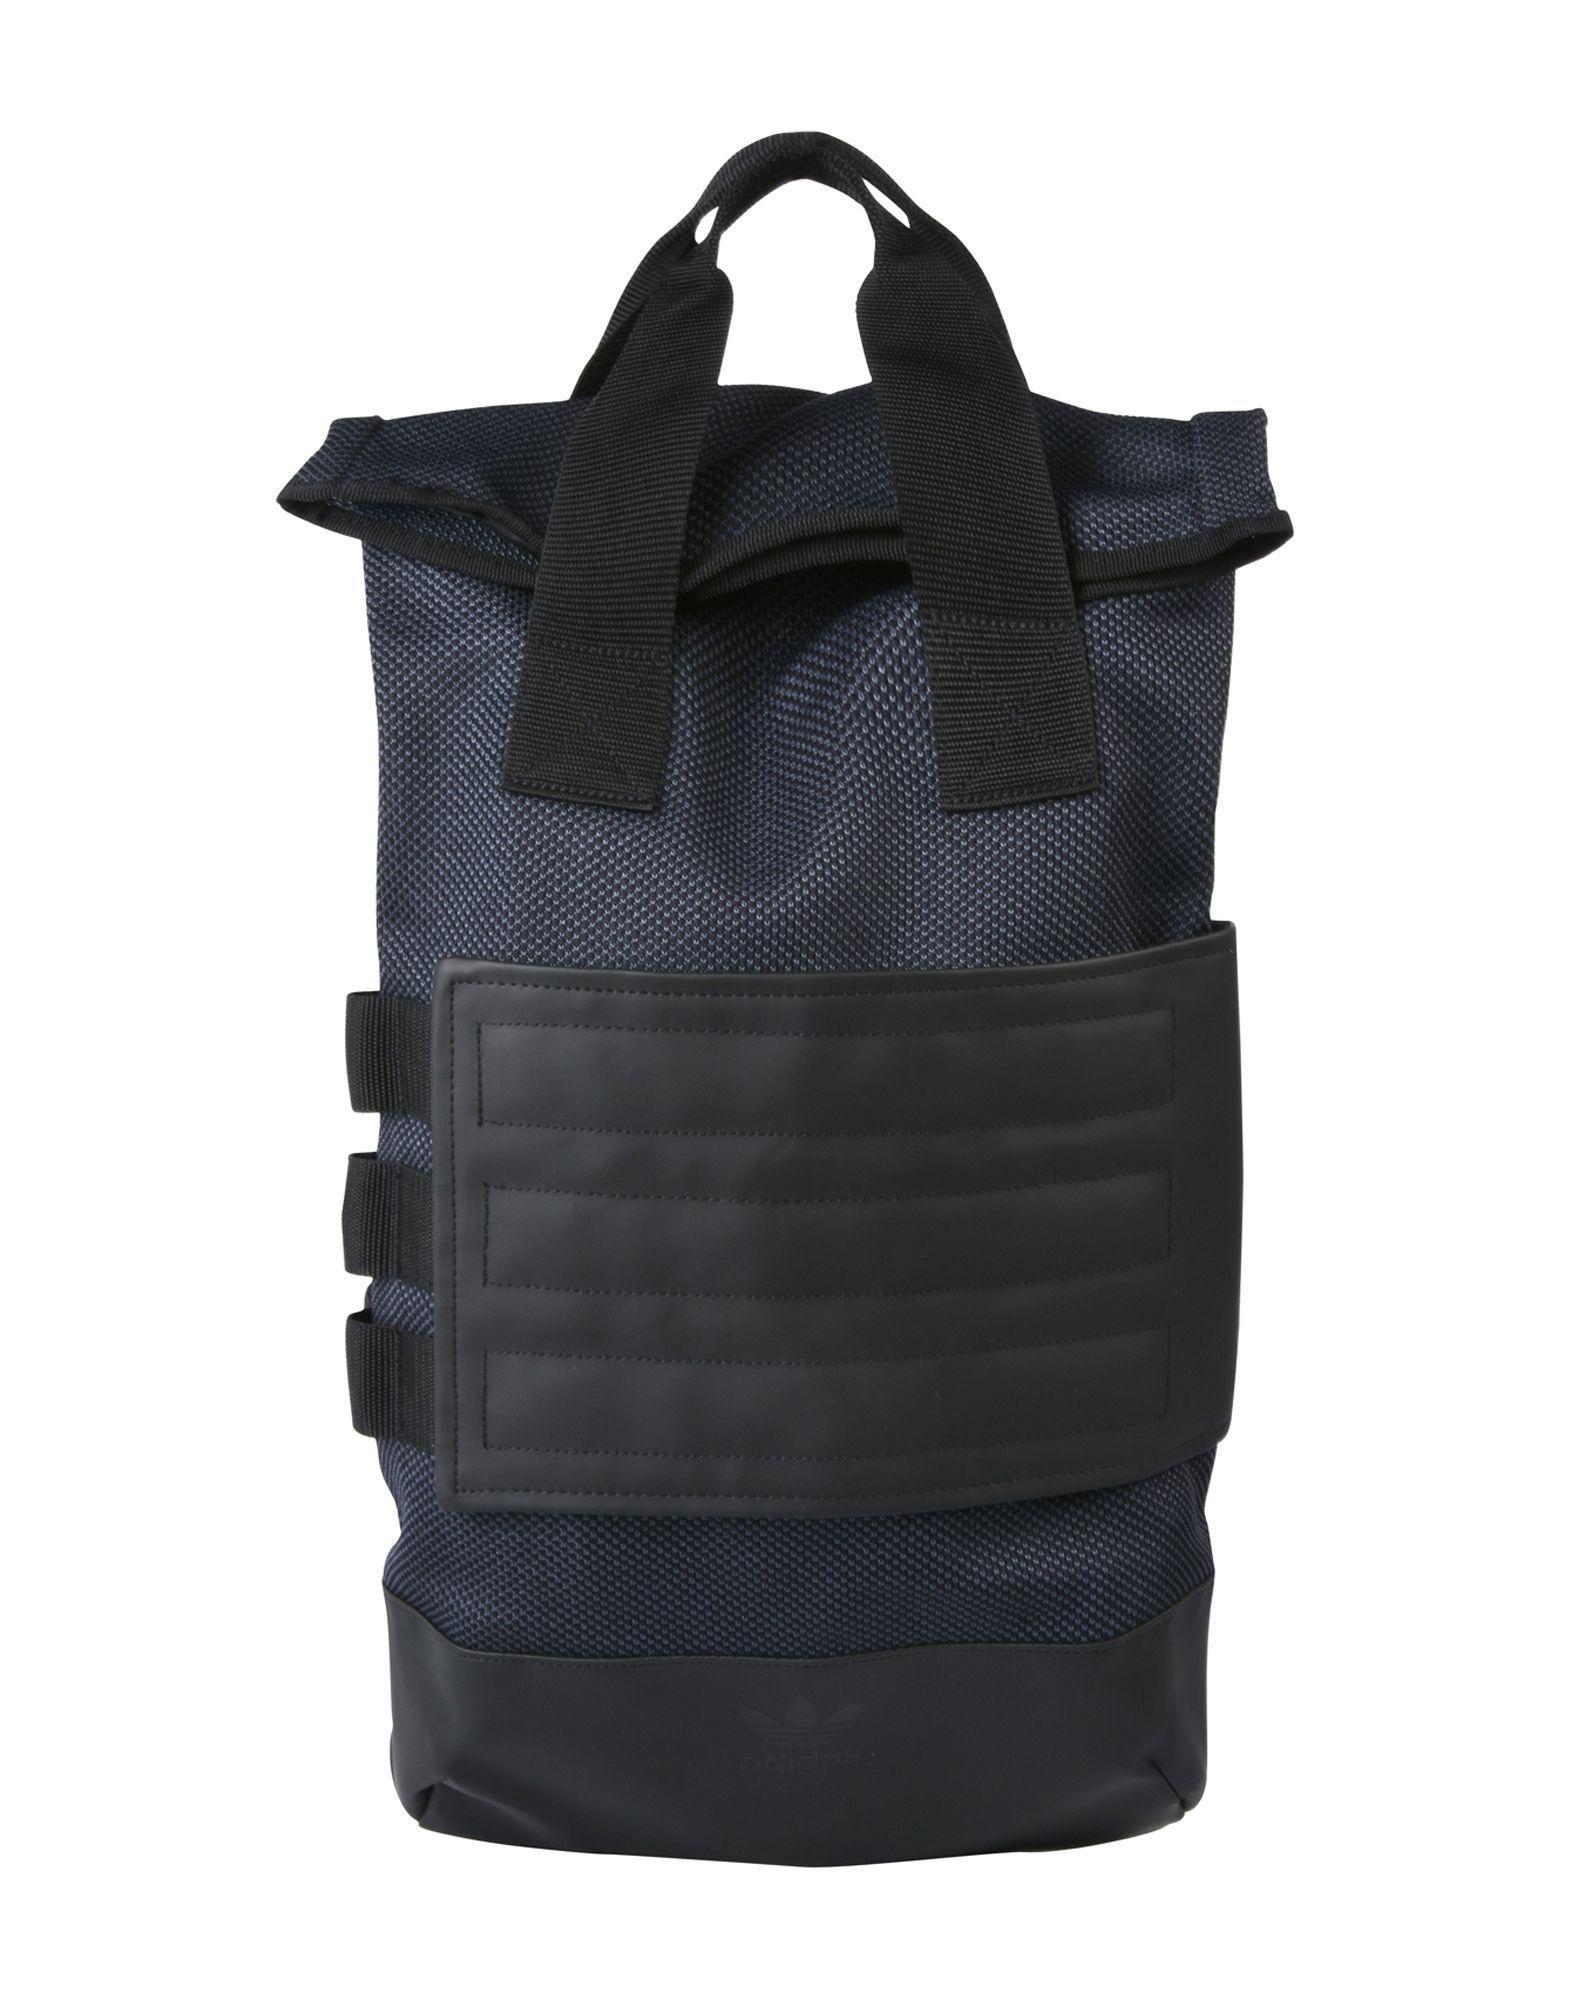 37f576f13d34 adidas Originals Backpacks   Fanny Packs in Black for Men - Lyst